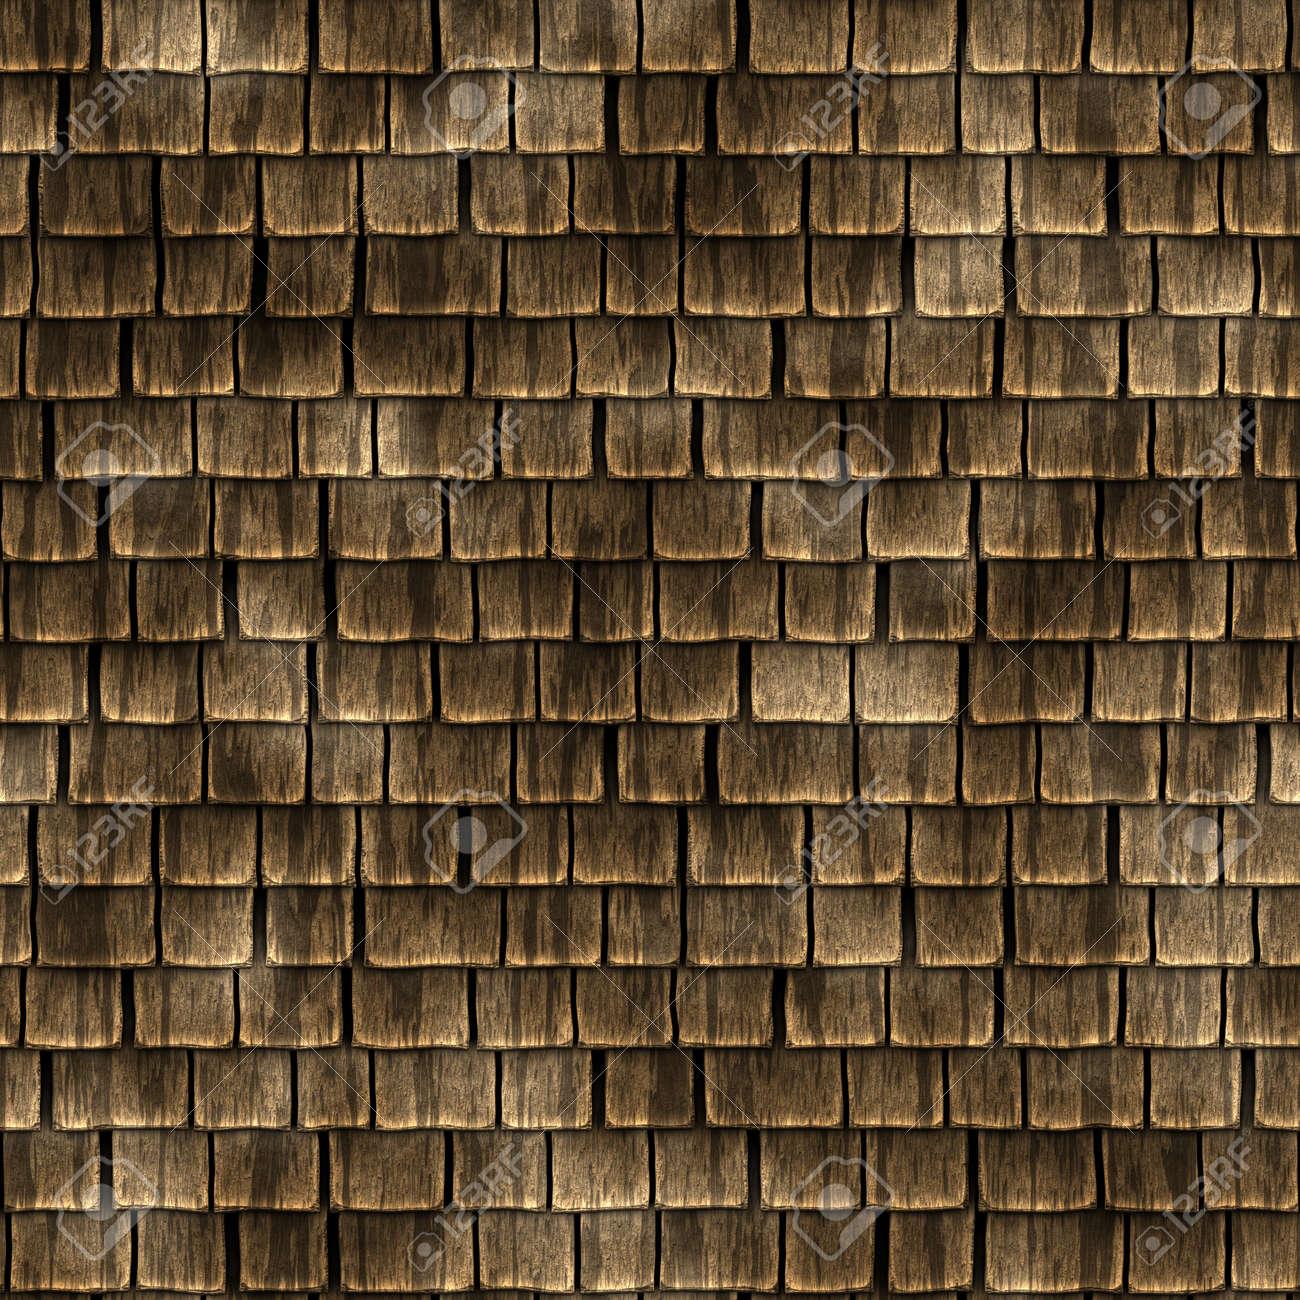 Wood Roof Shingles Texture